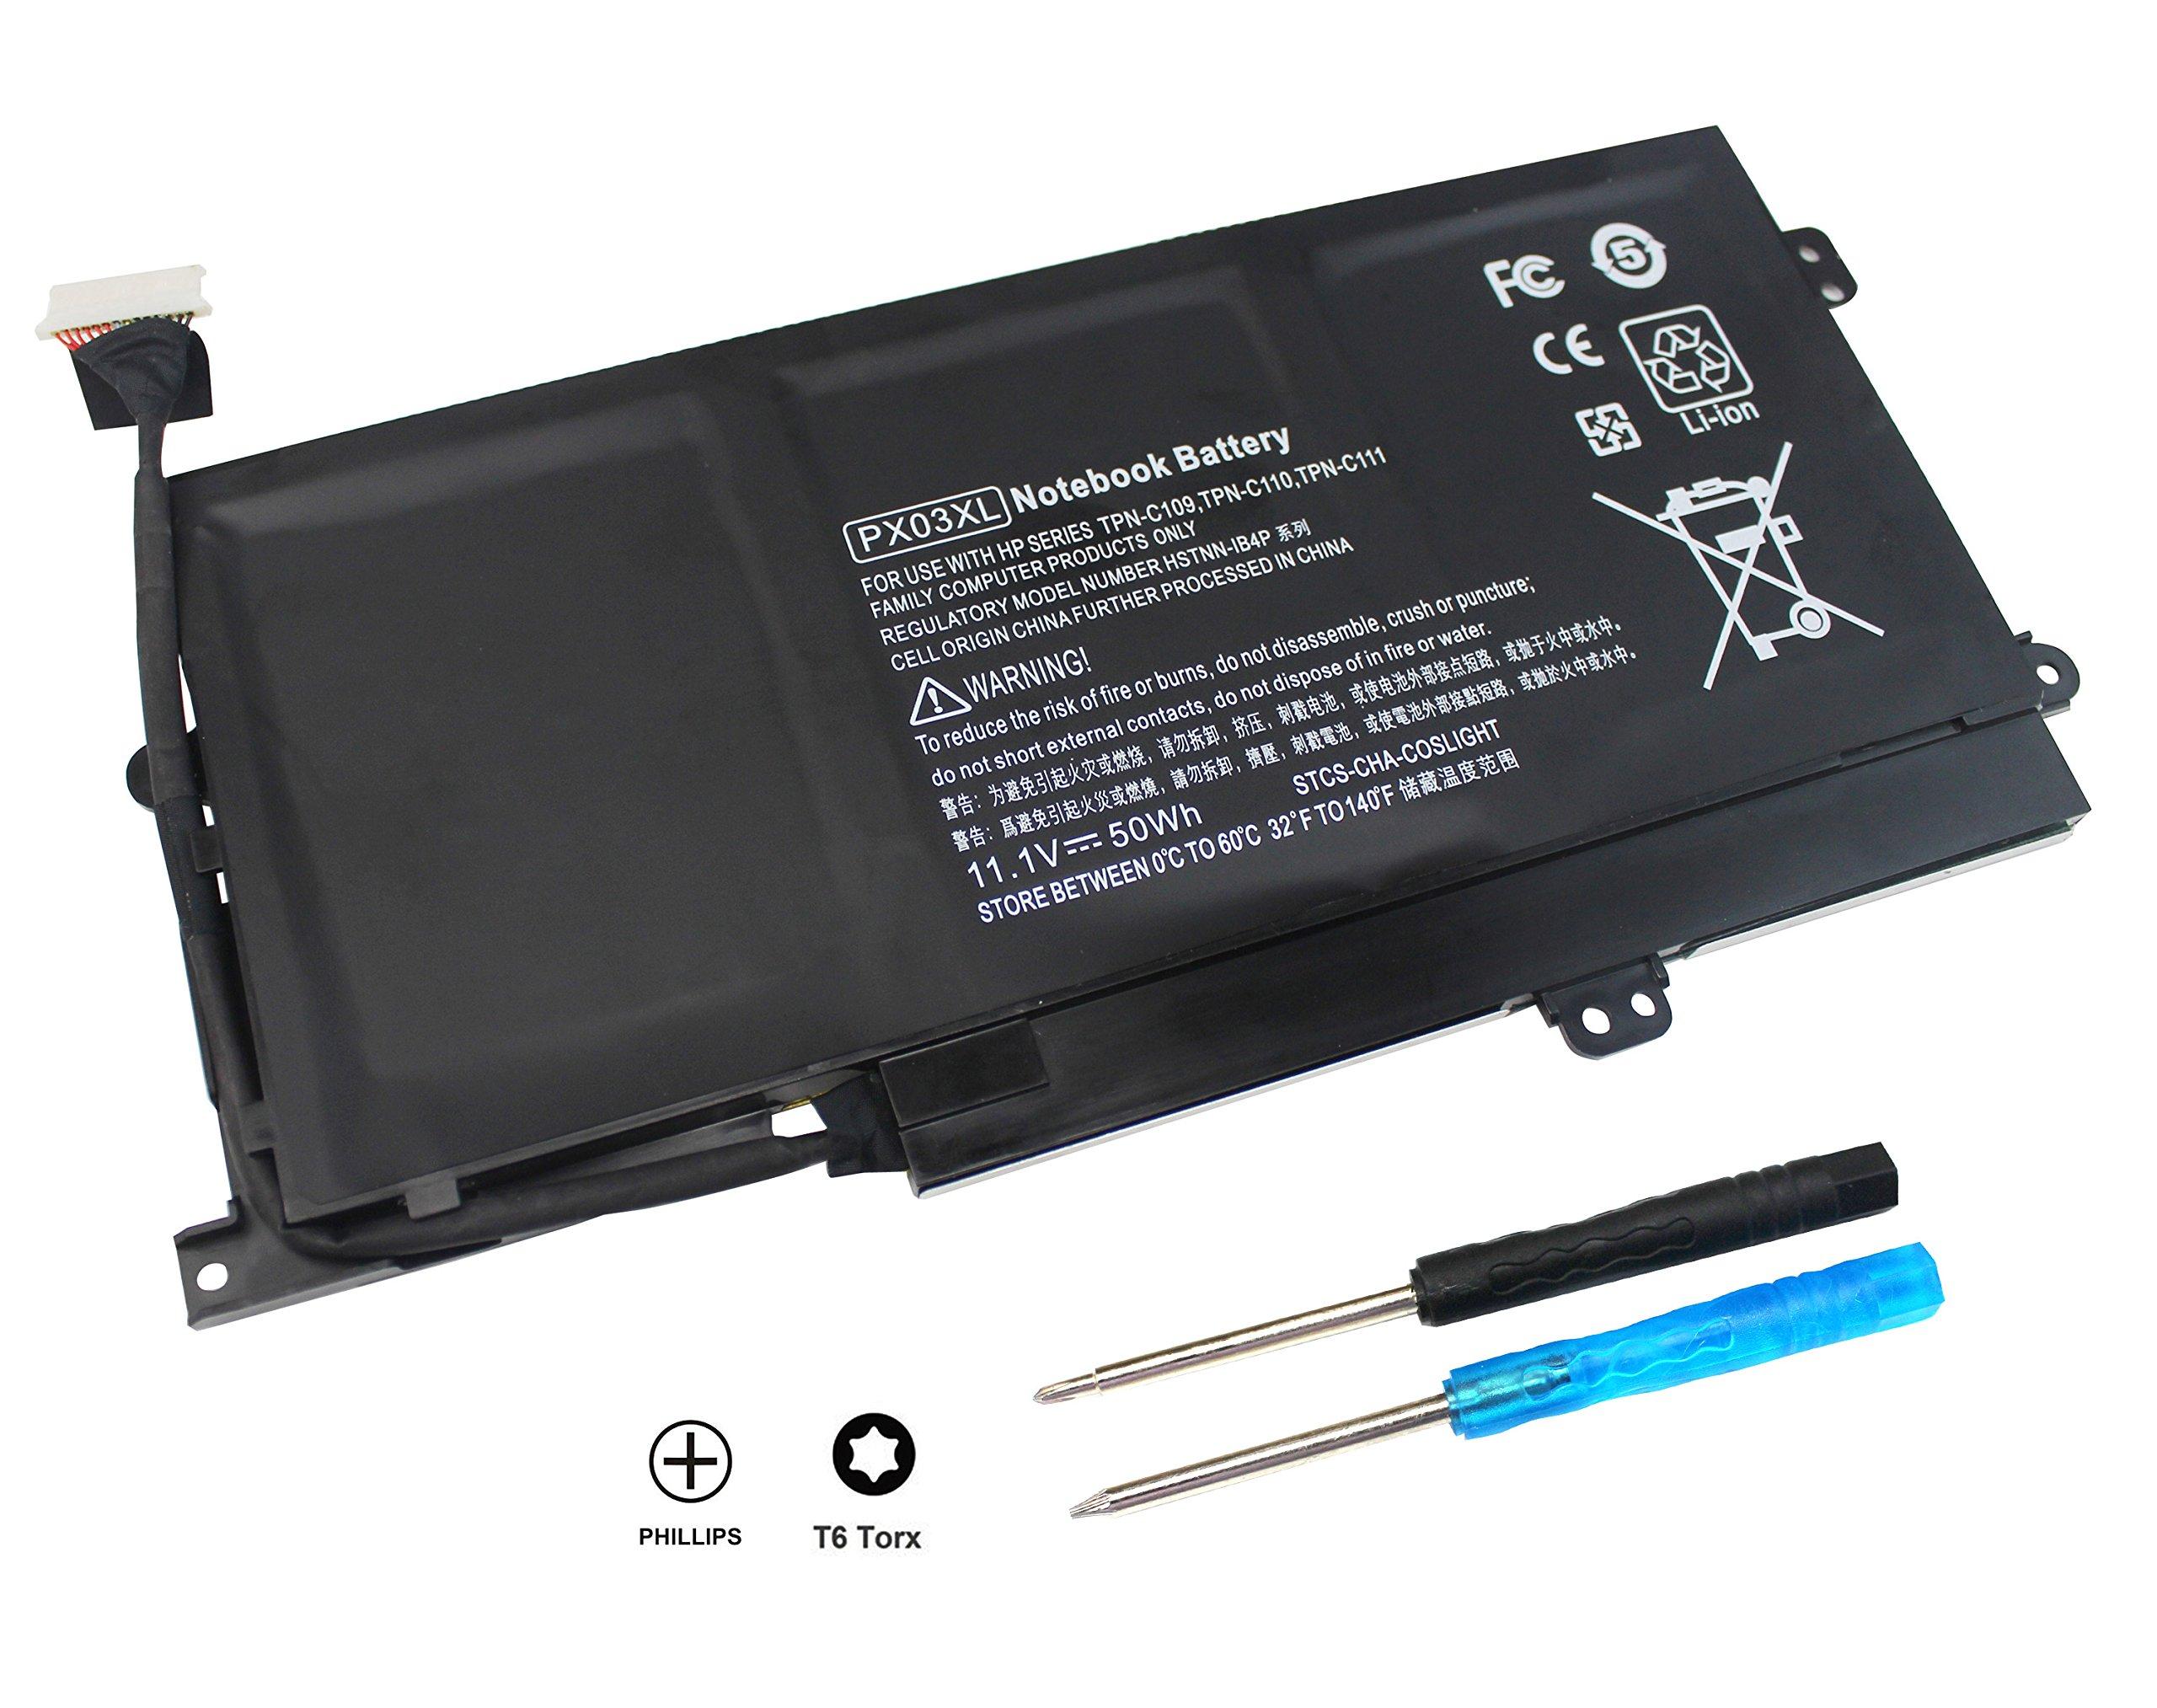 Bateria PX03XL para HP Envy 14 Touchsmart M6 Series M6-K K002TX K022DX M6-k125dx M6-k025dx m6-k010dx M6-k012dx M6-k022dx